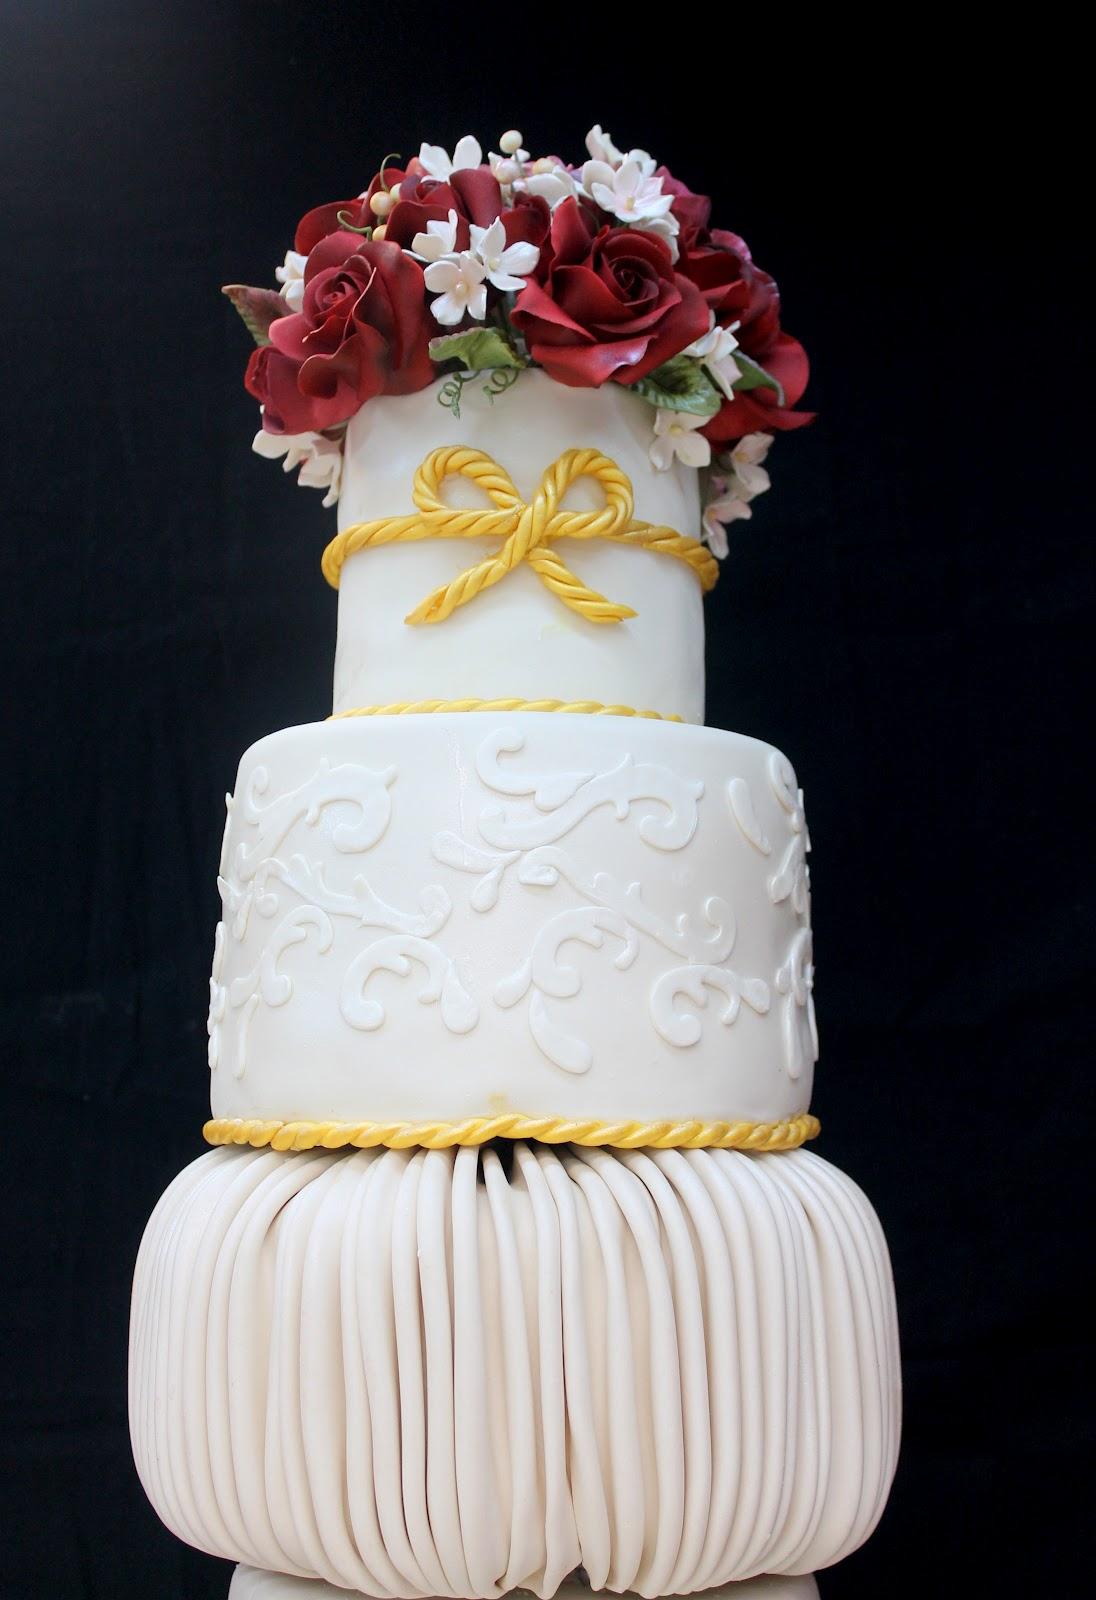 Complete Deelite 7 Tier Burgundy Rose Wedding Cake